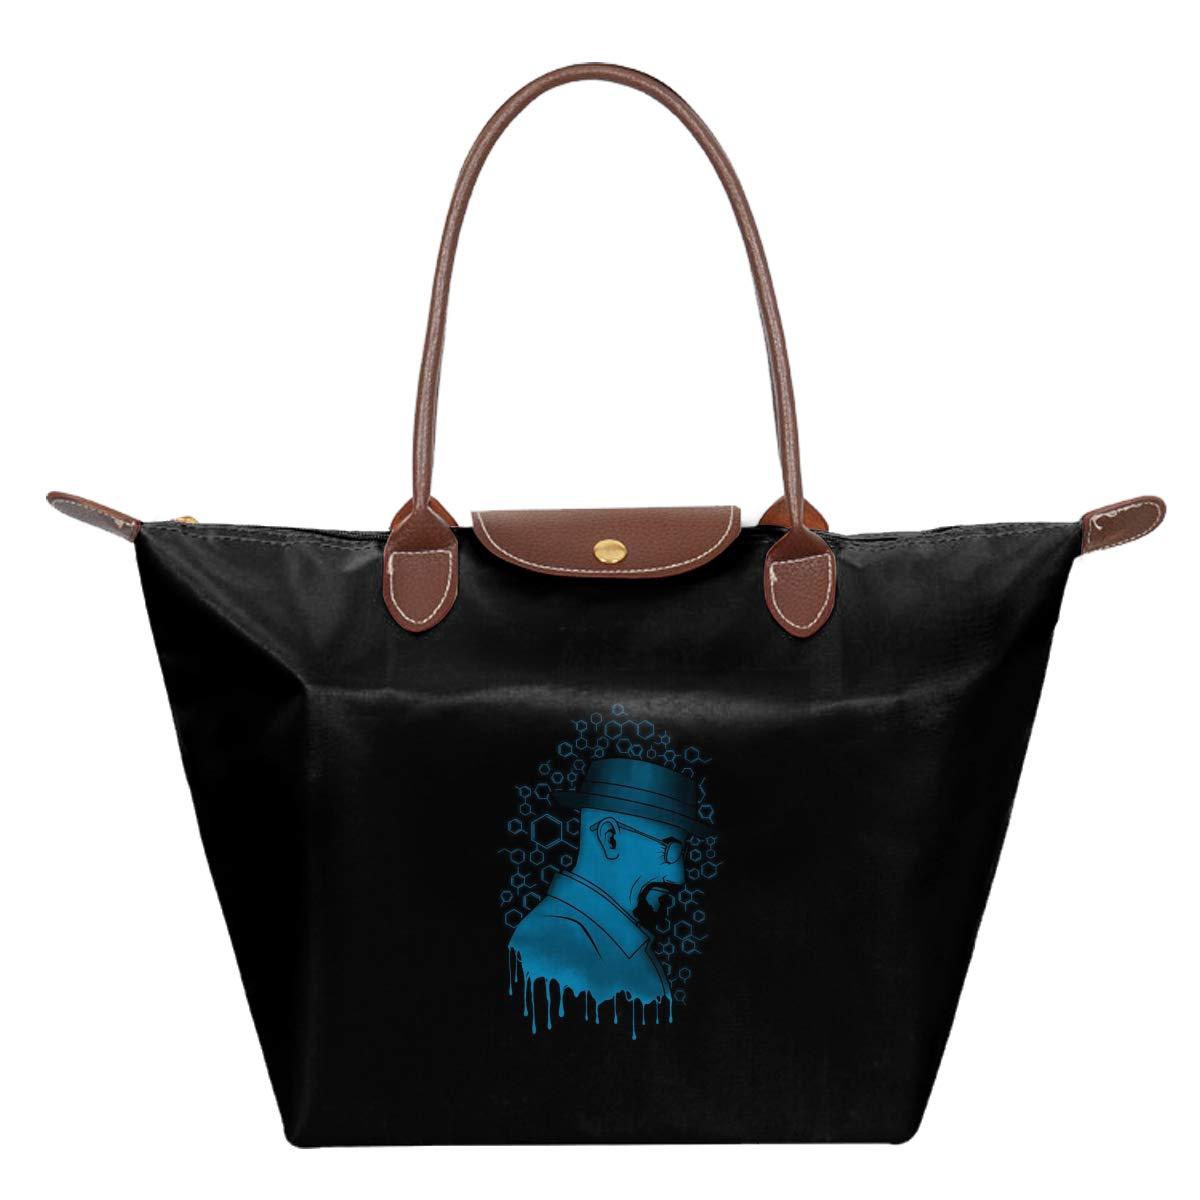 Crystal Chemist Breaking Bad Waterproof Leather Folded Messenger Nylon Bag Travel Tote Hopping Folding School Handbags